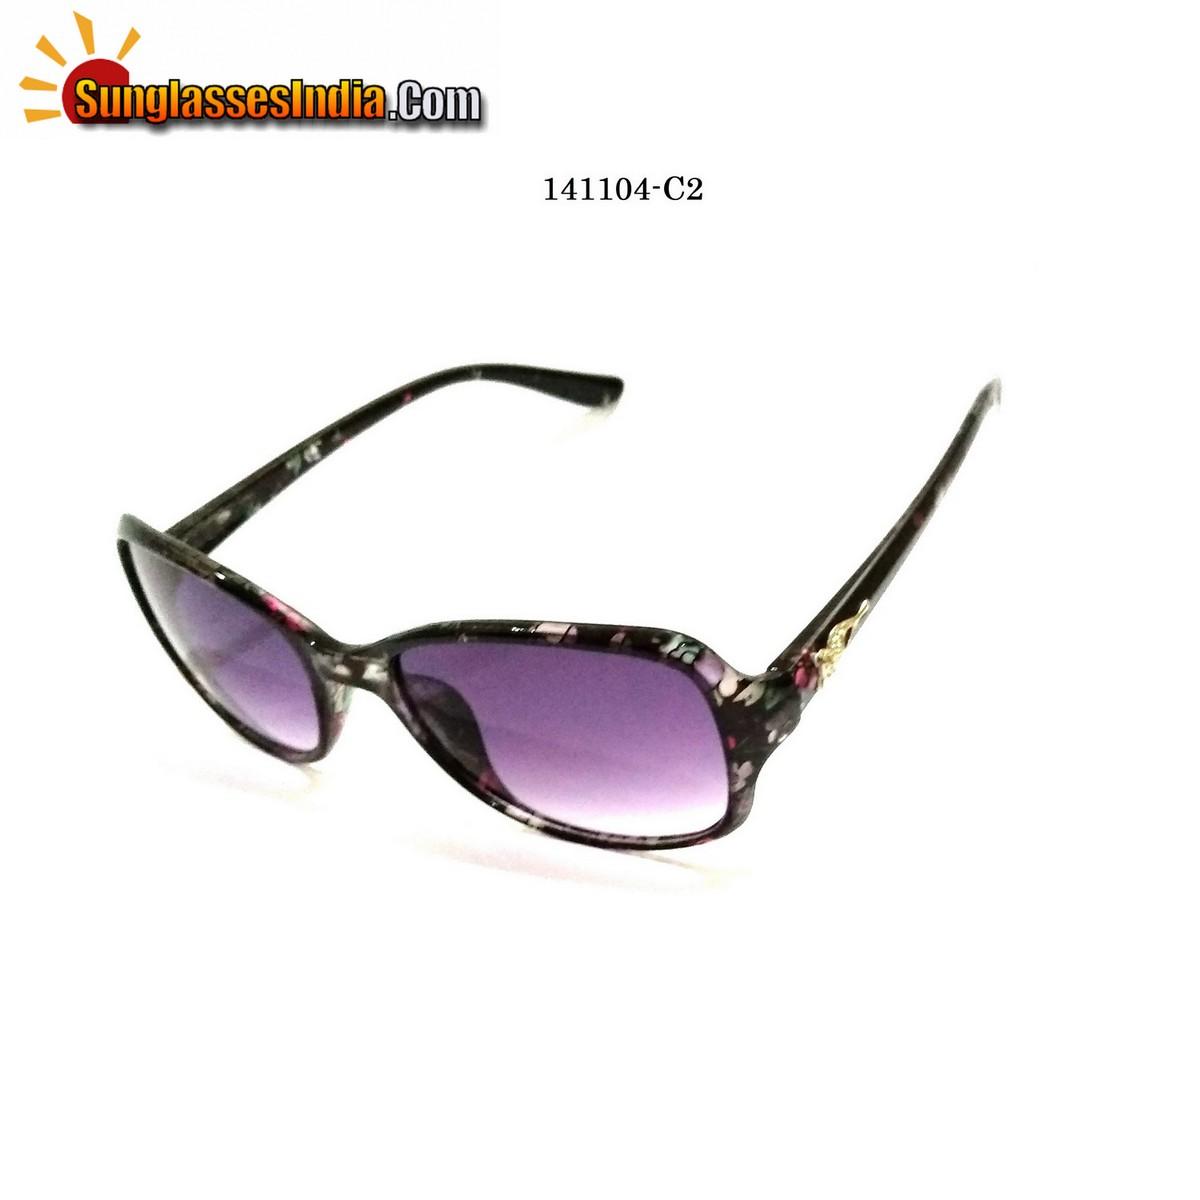 Floral Print Ladies Women Sunglasses Model 1141004C2